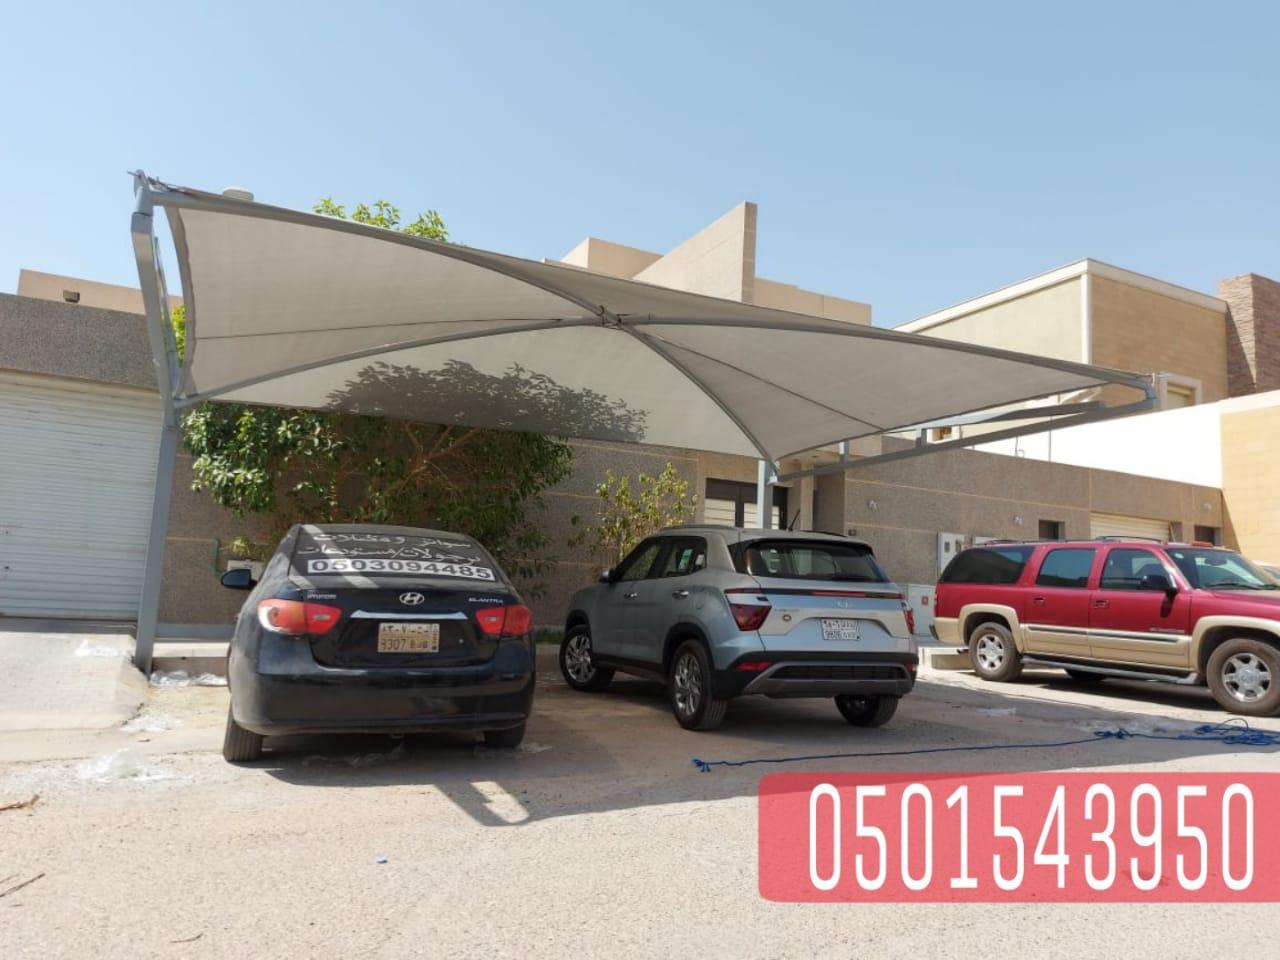 تركيب مظلات سيارات في جدة , 0501543950 P_20868p0dc5